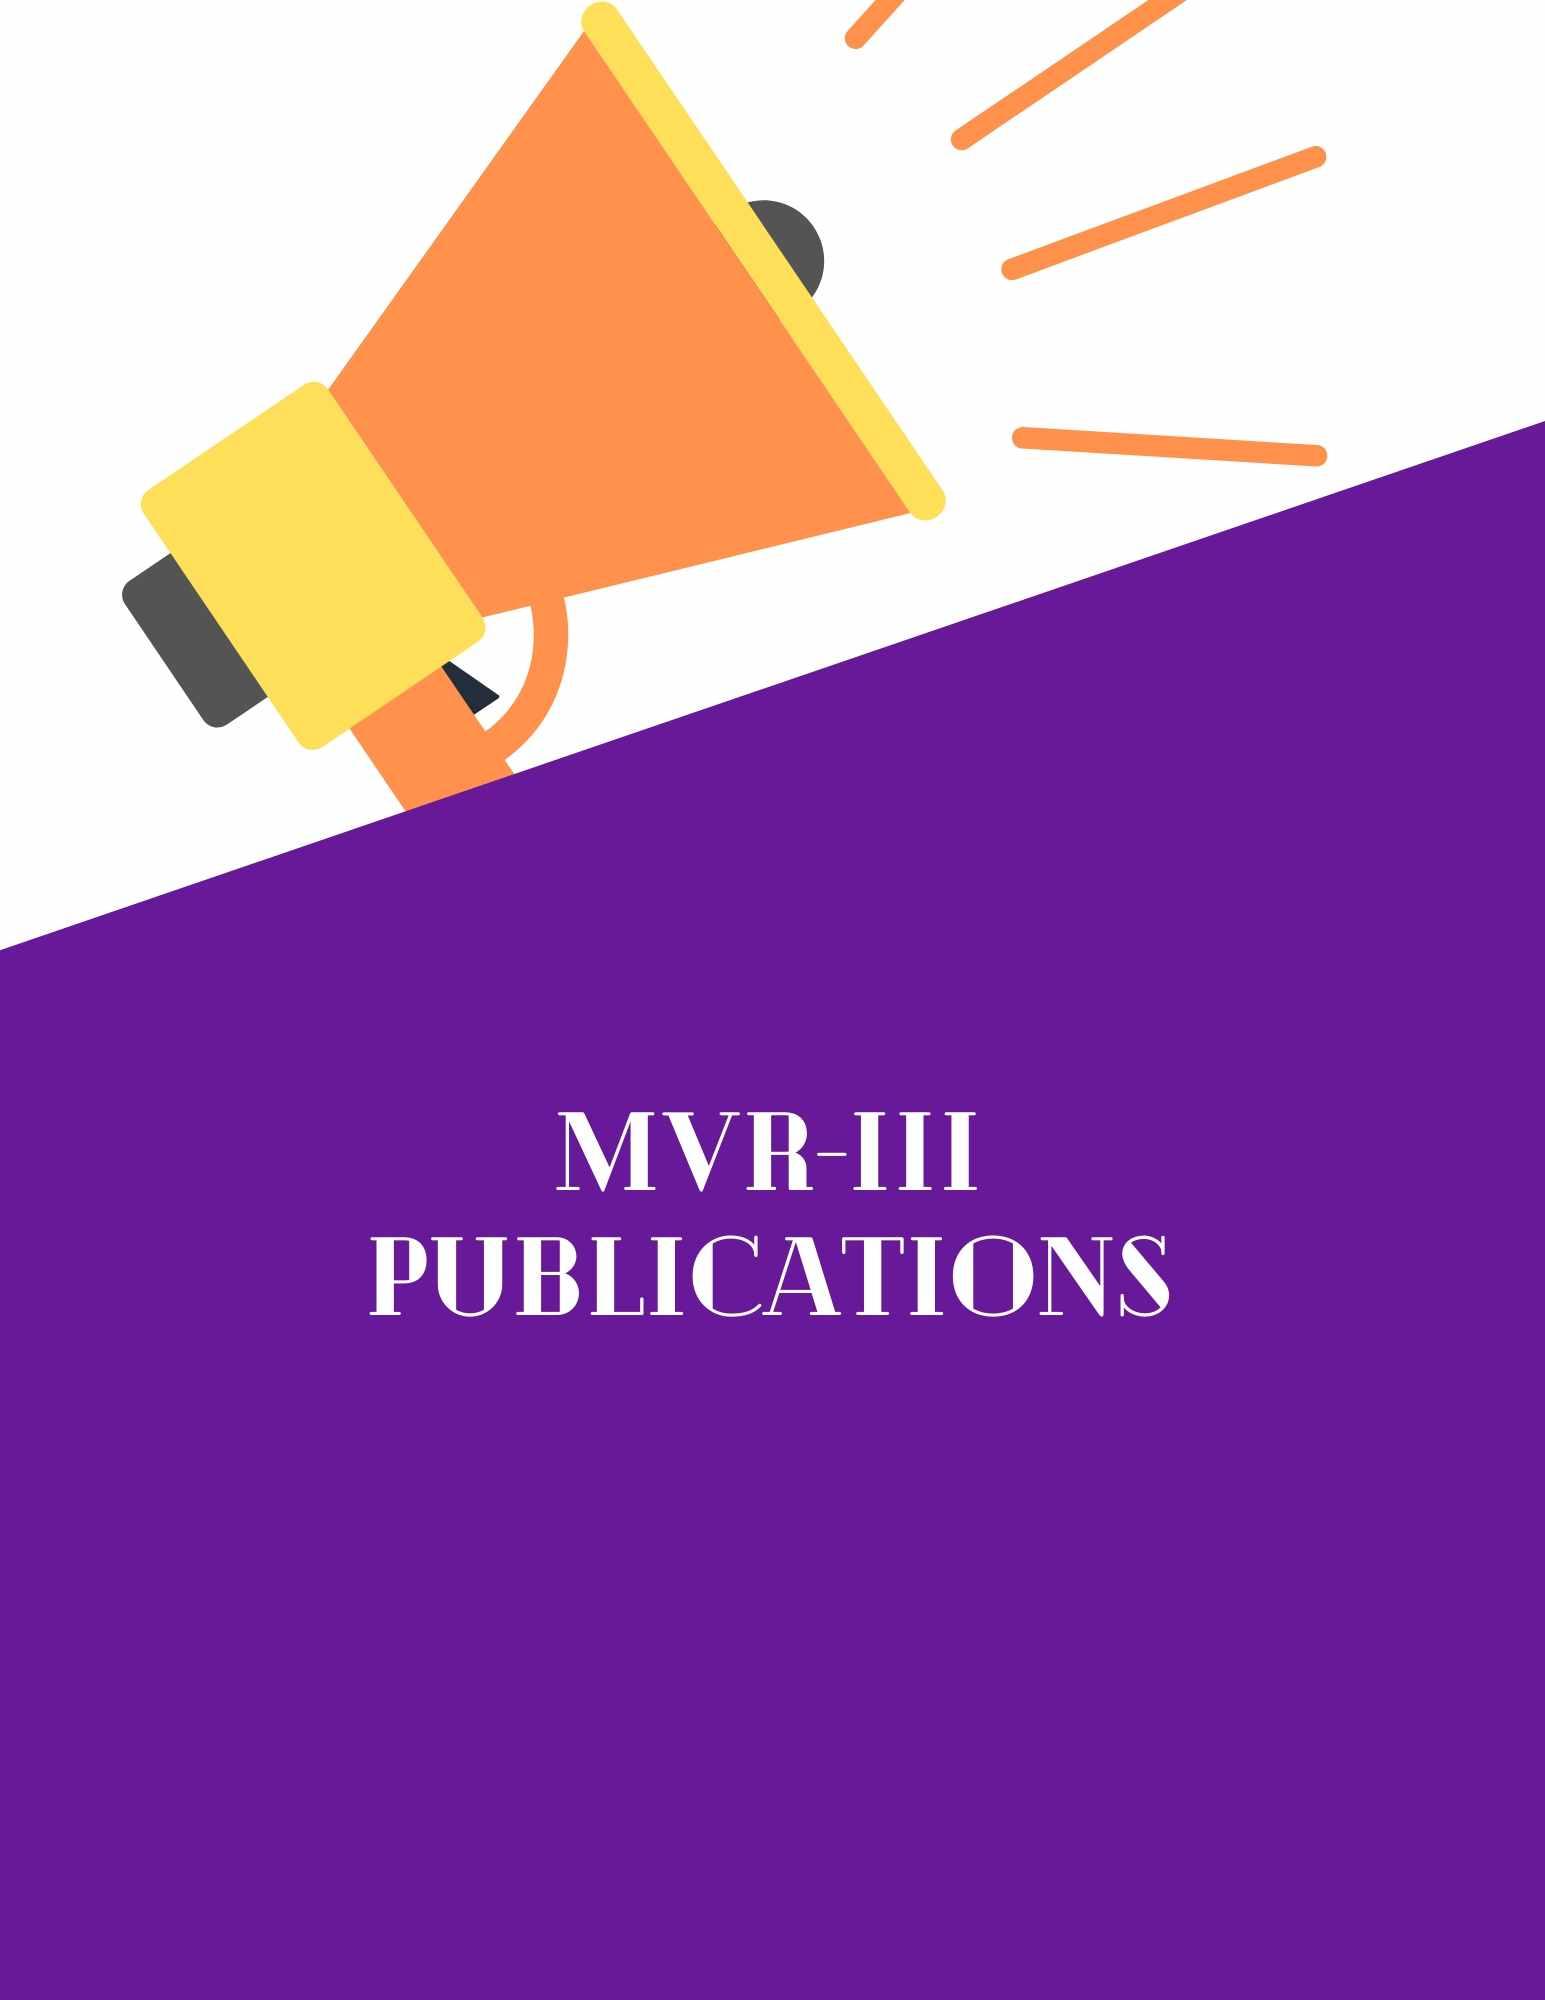 MVR-III Publications